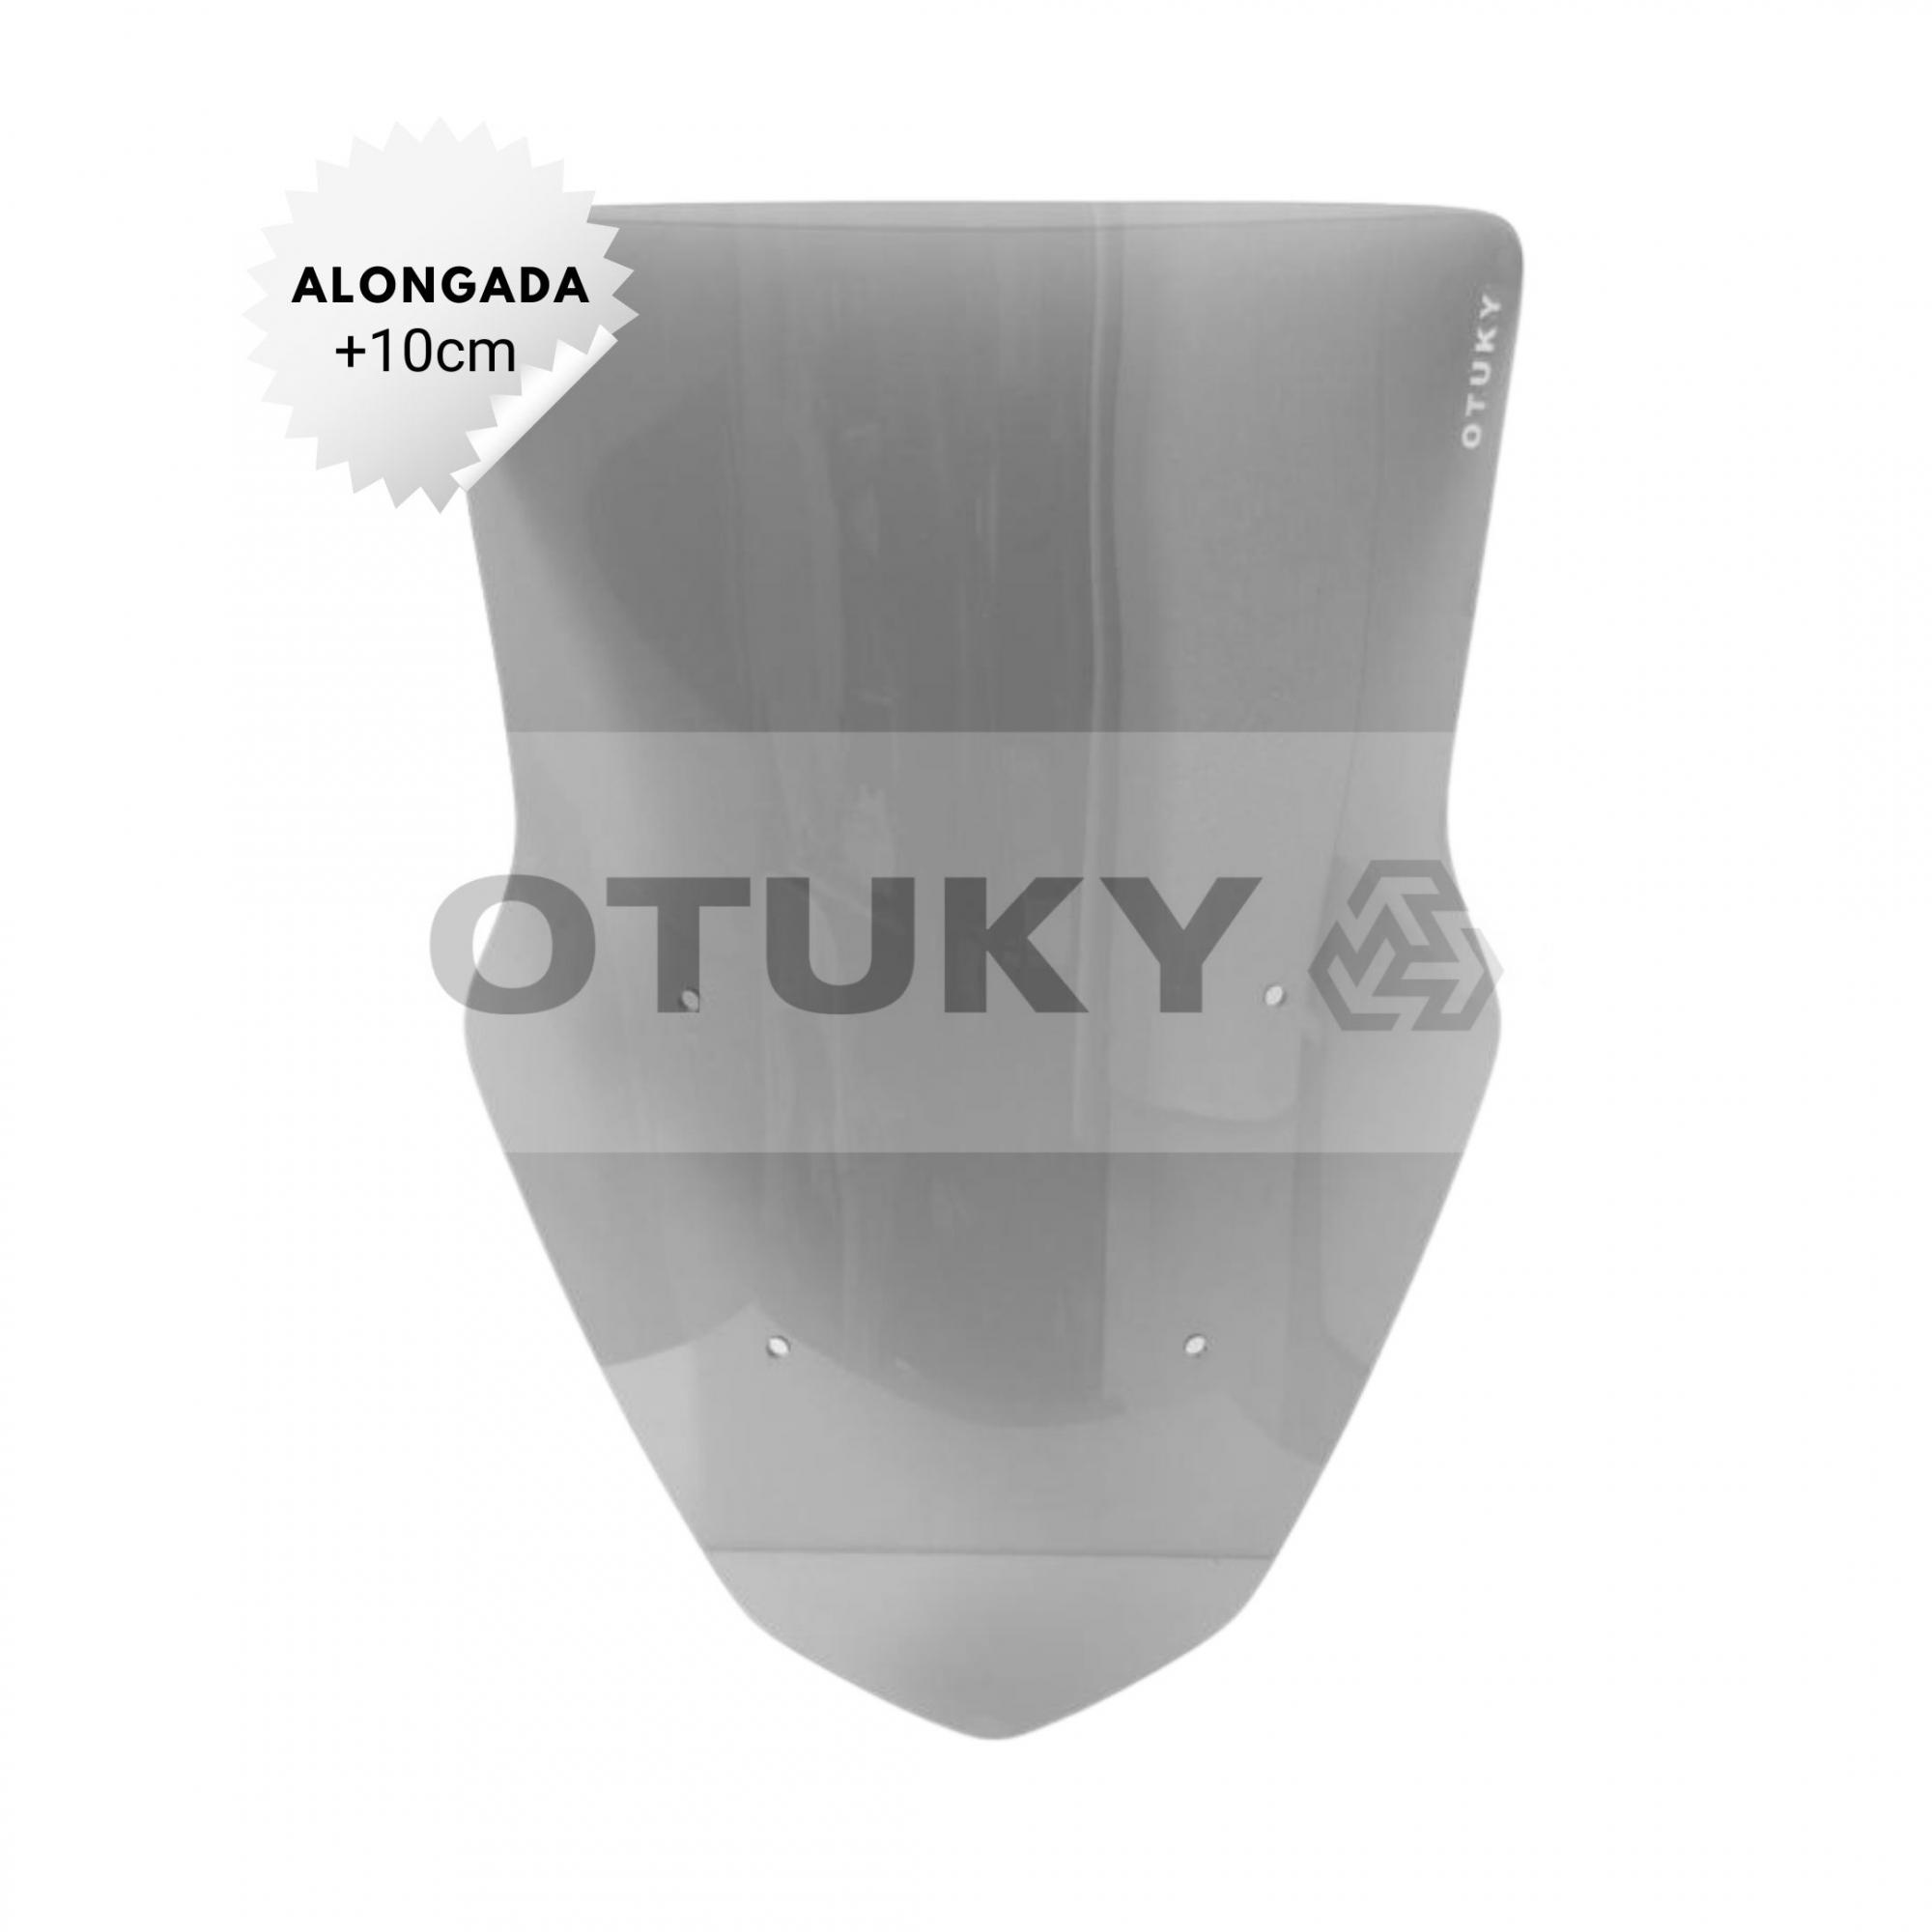 Bolha para Moto Nmax 160 2017 2018 2019 2020 Alongada +10cm Otuky